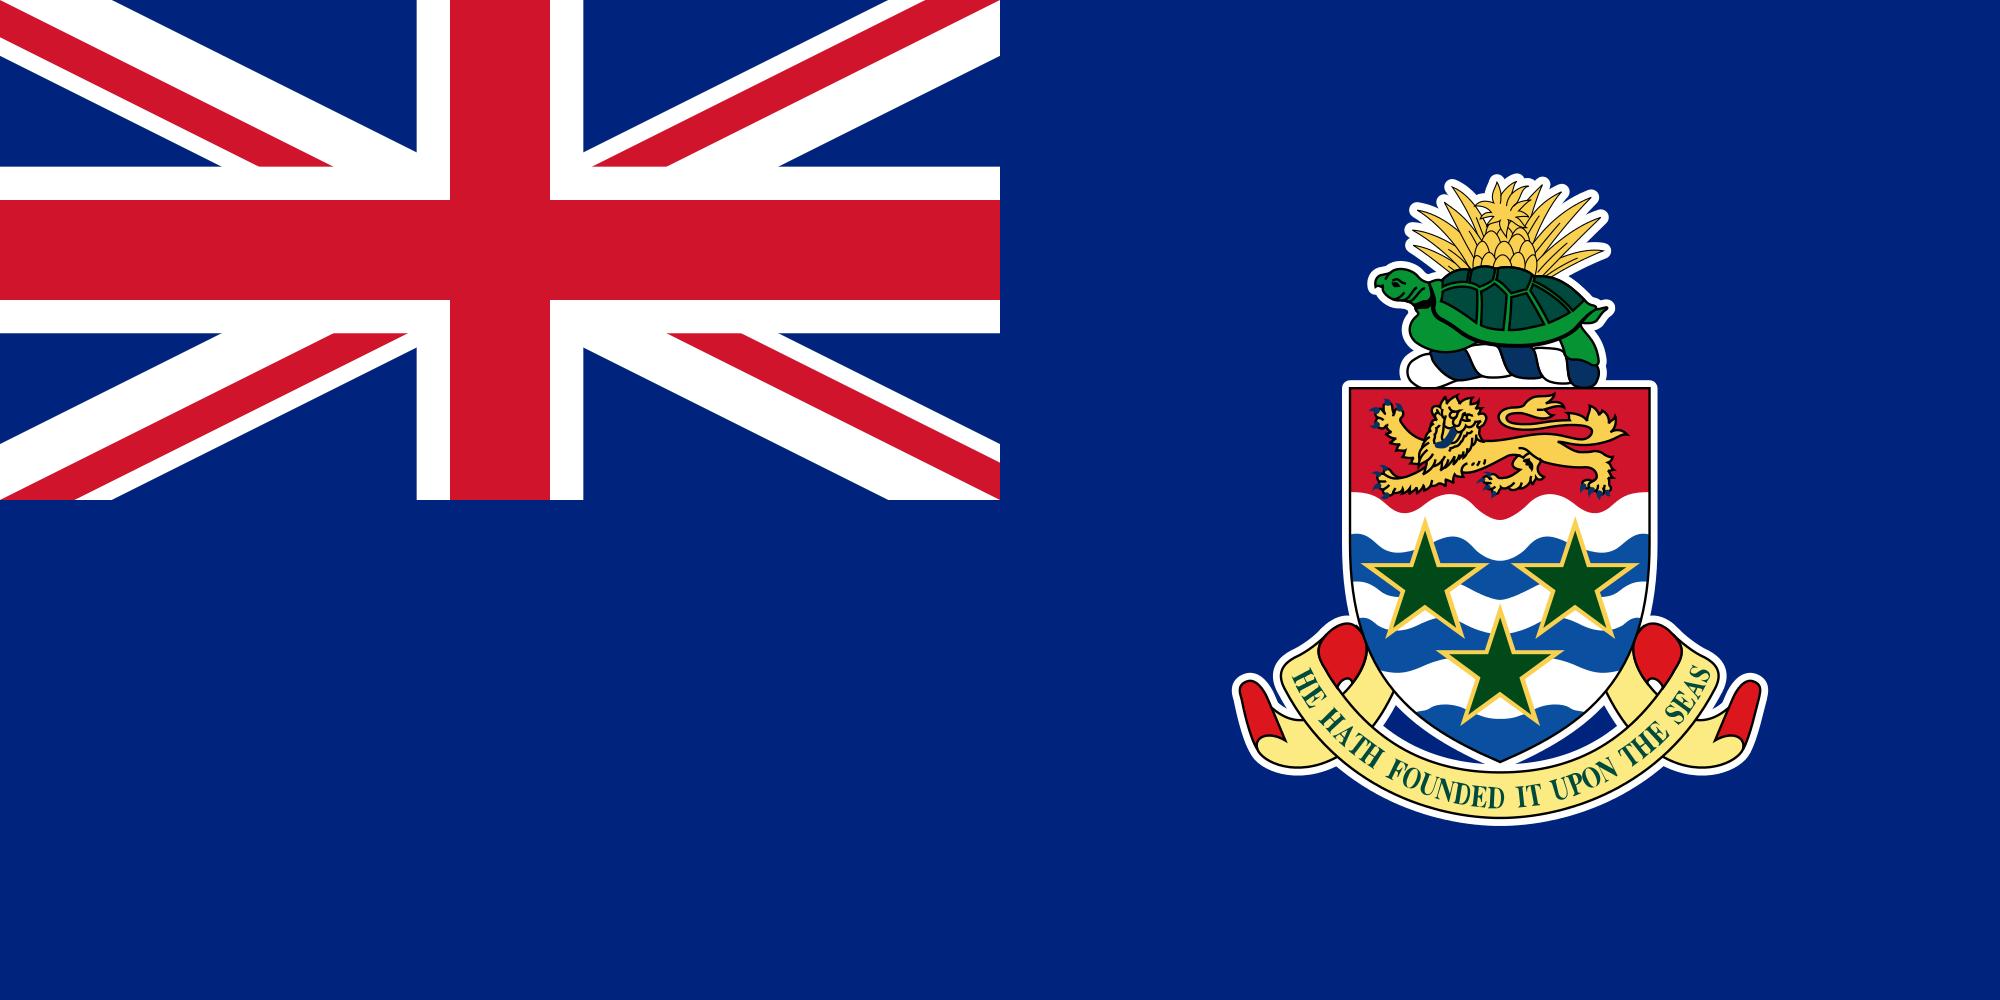 Isole Cayman, paese, emblema, logo, simbolo - Sfondi HD - Professor-falken.com